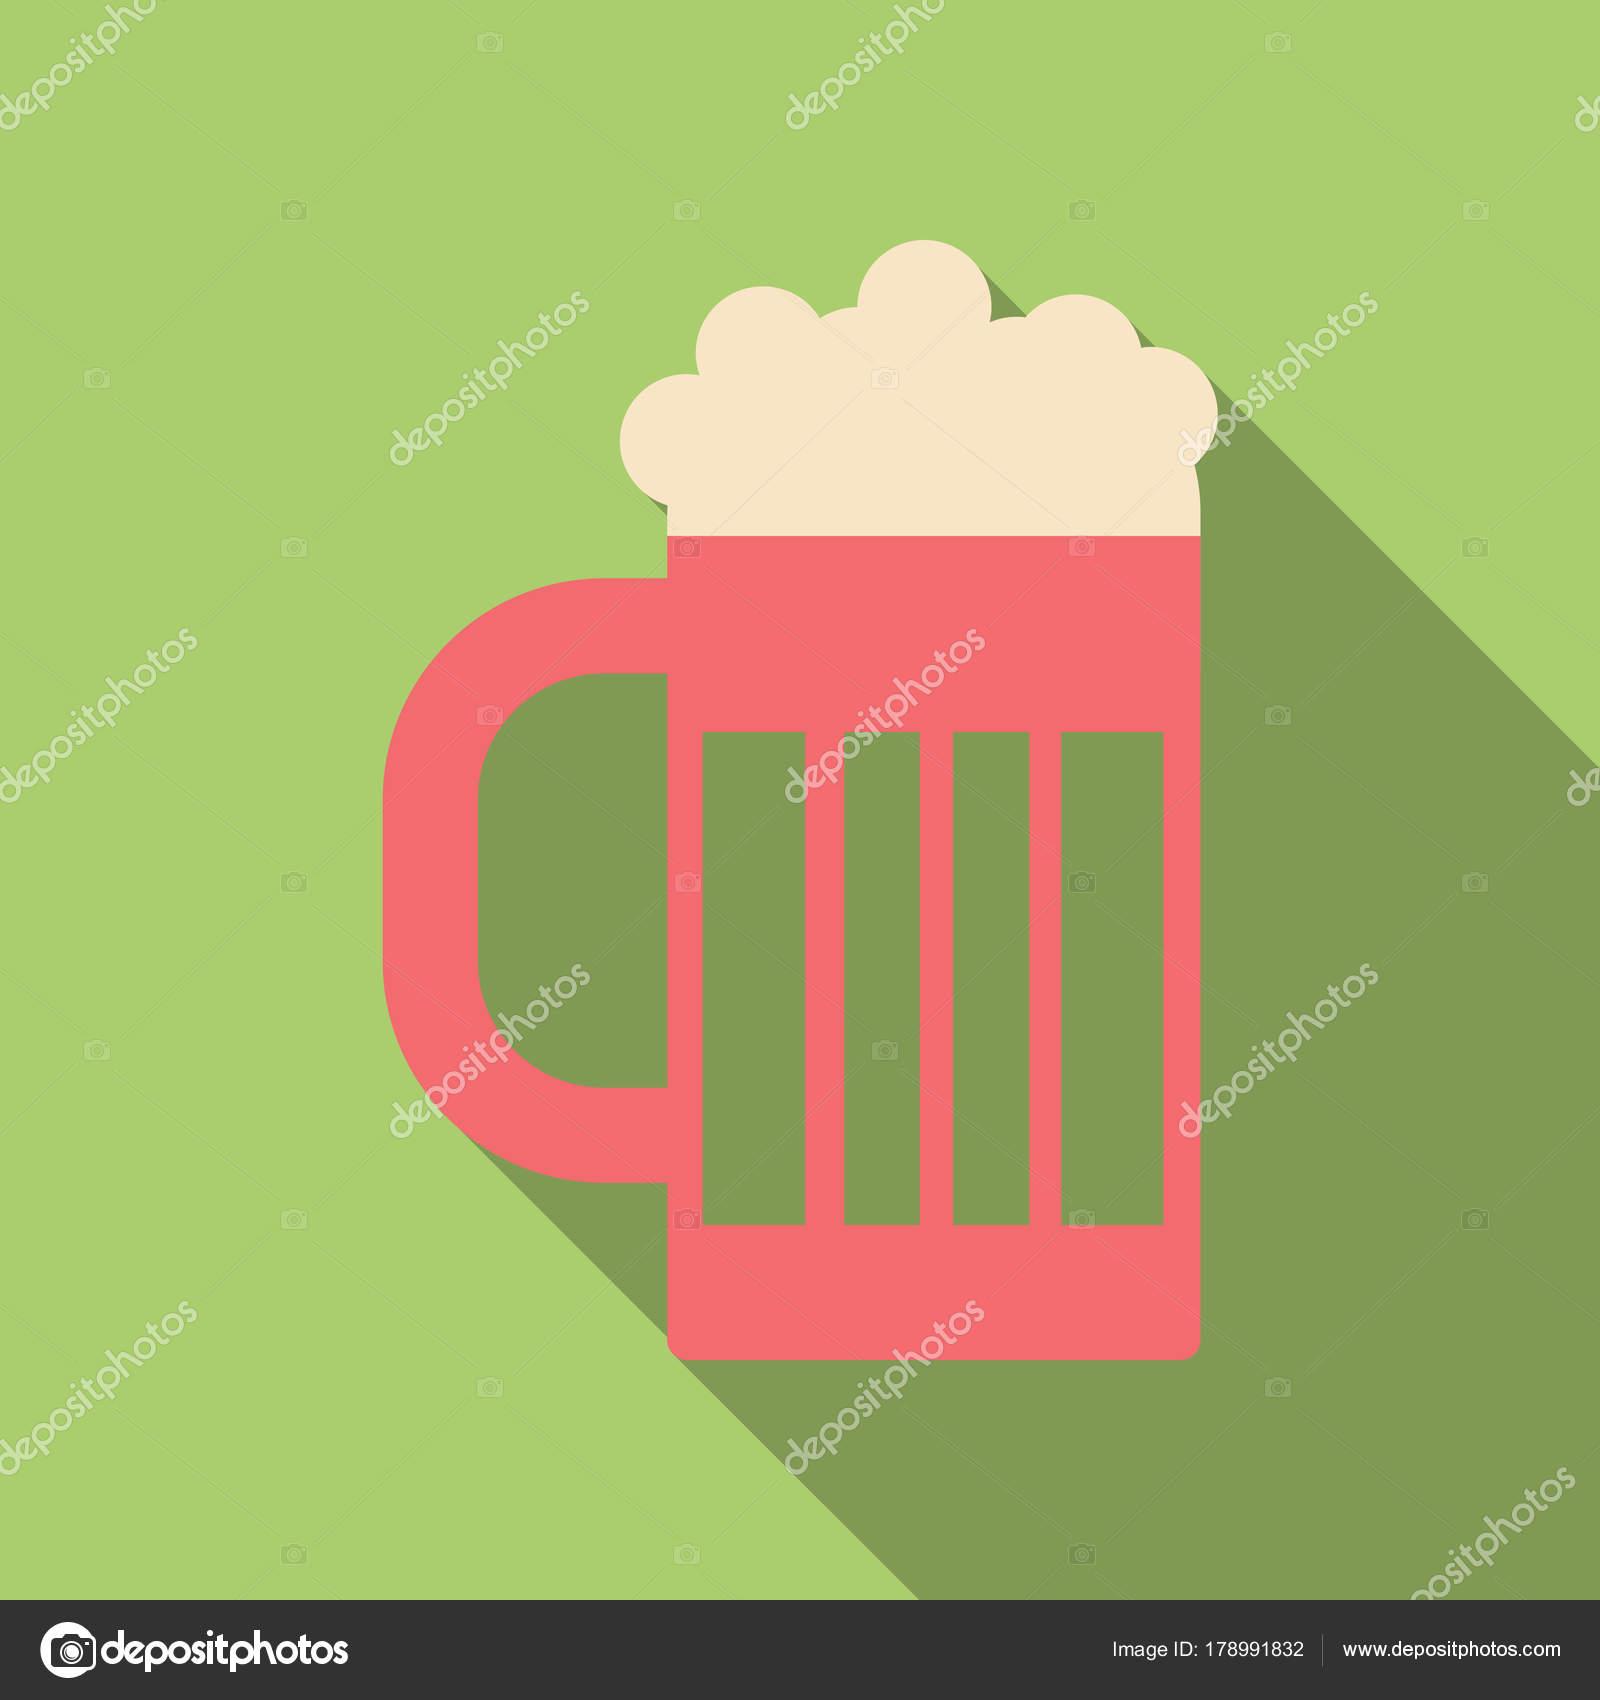 Beer glass icon iweb sign symbol logo label stock vector beer glass icon iweb sign symbol logo label stock vector buycottarizona Images